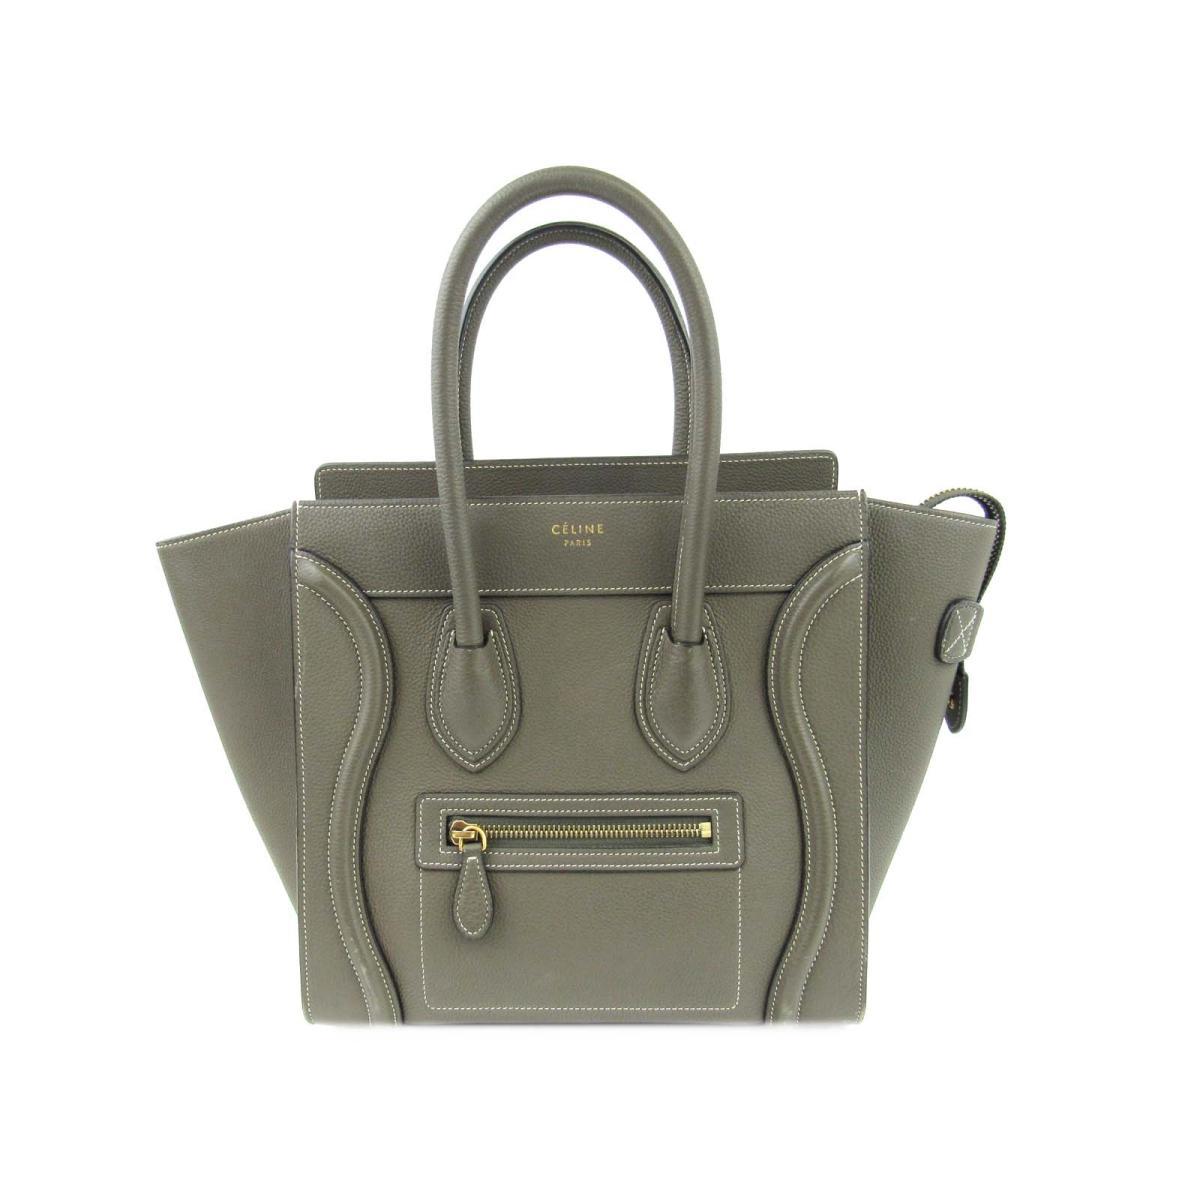 Authentic CELINE Luggage Micro Shopper Hand Tote Bag Leather (calf) Khaki 1dd71a04b1ea9